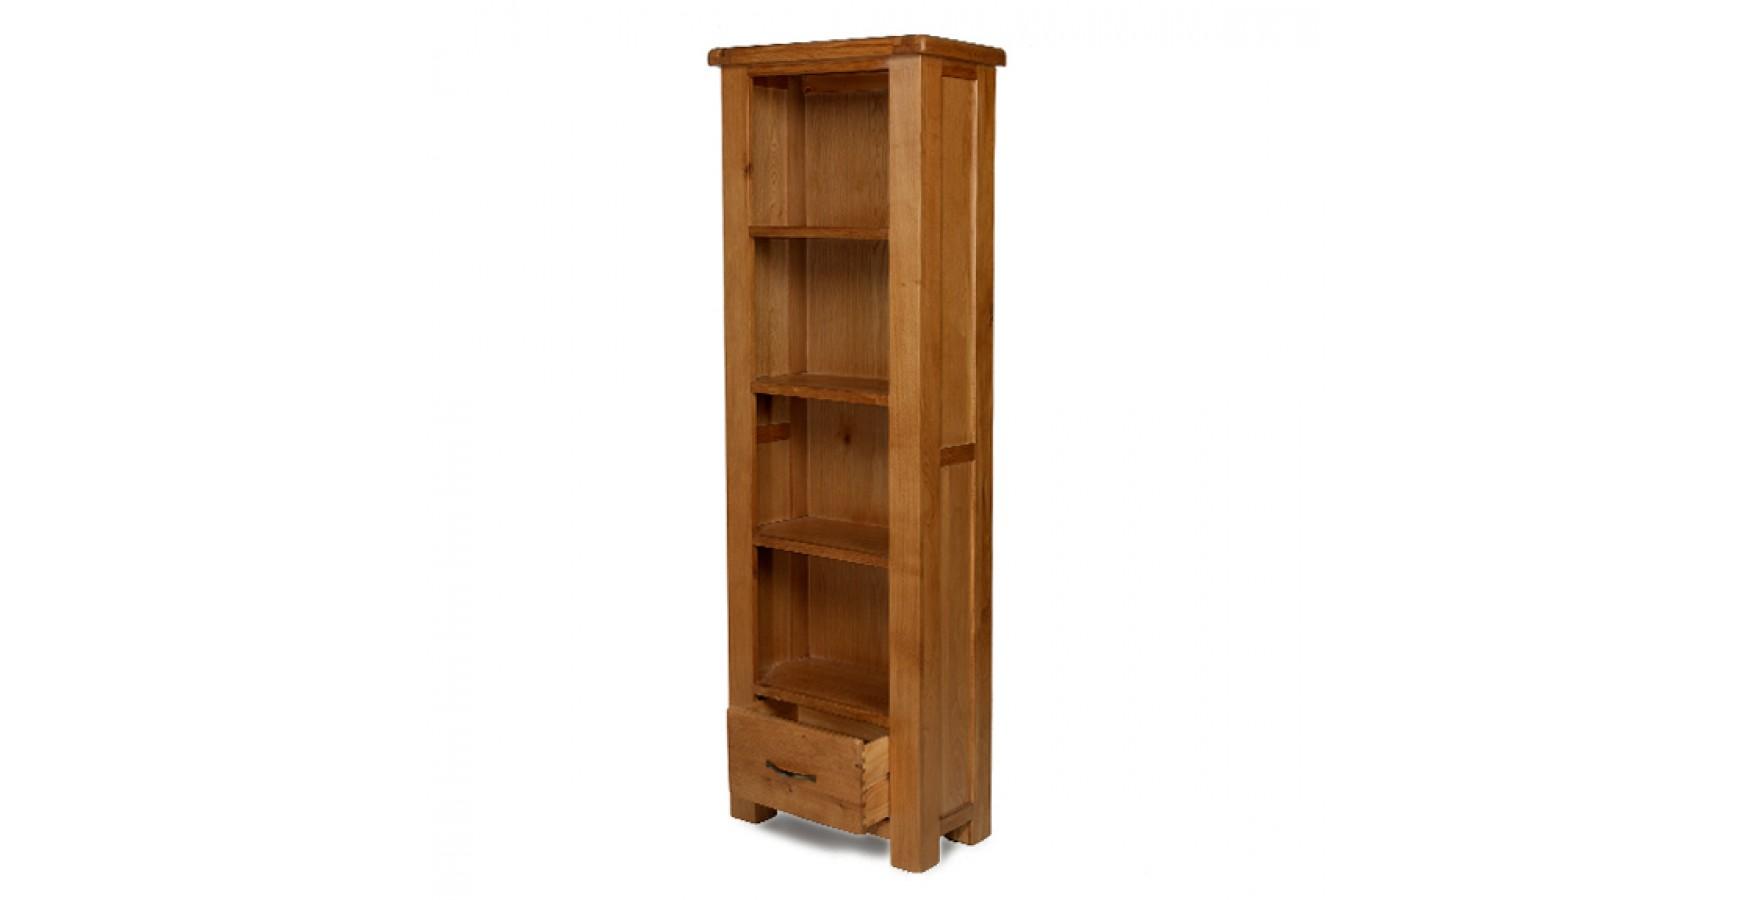 Emsworth Oak Slim Bookcase with Drawer - Lifestyle Furniture UK